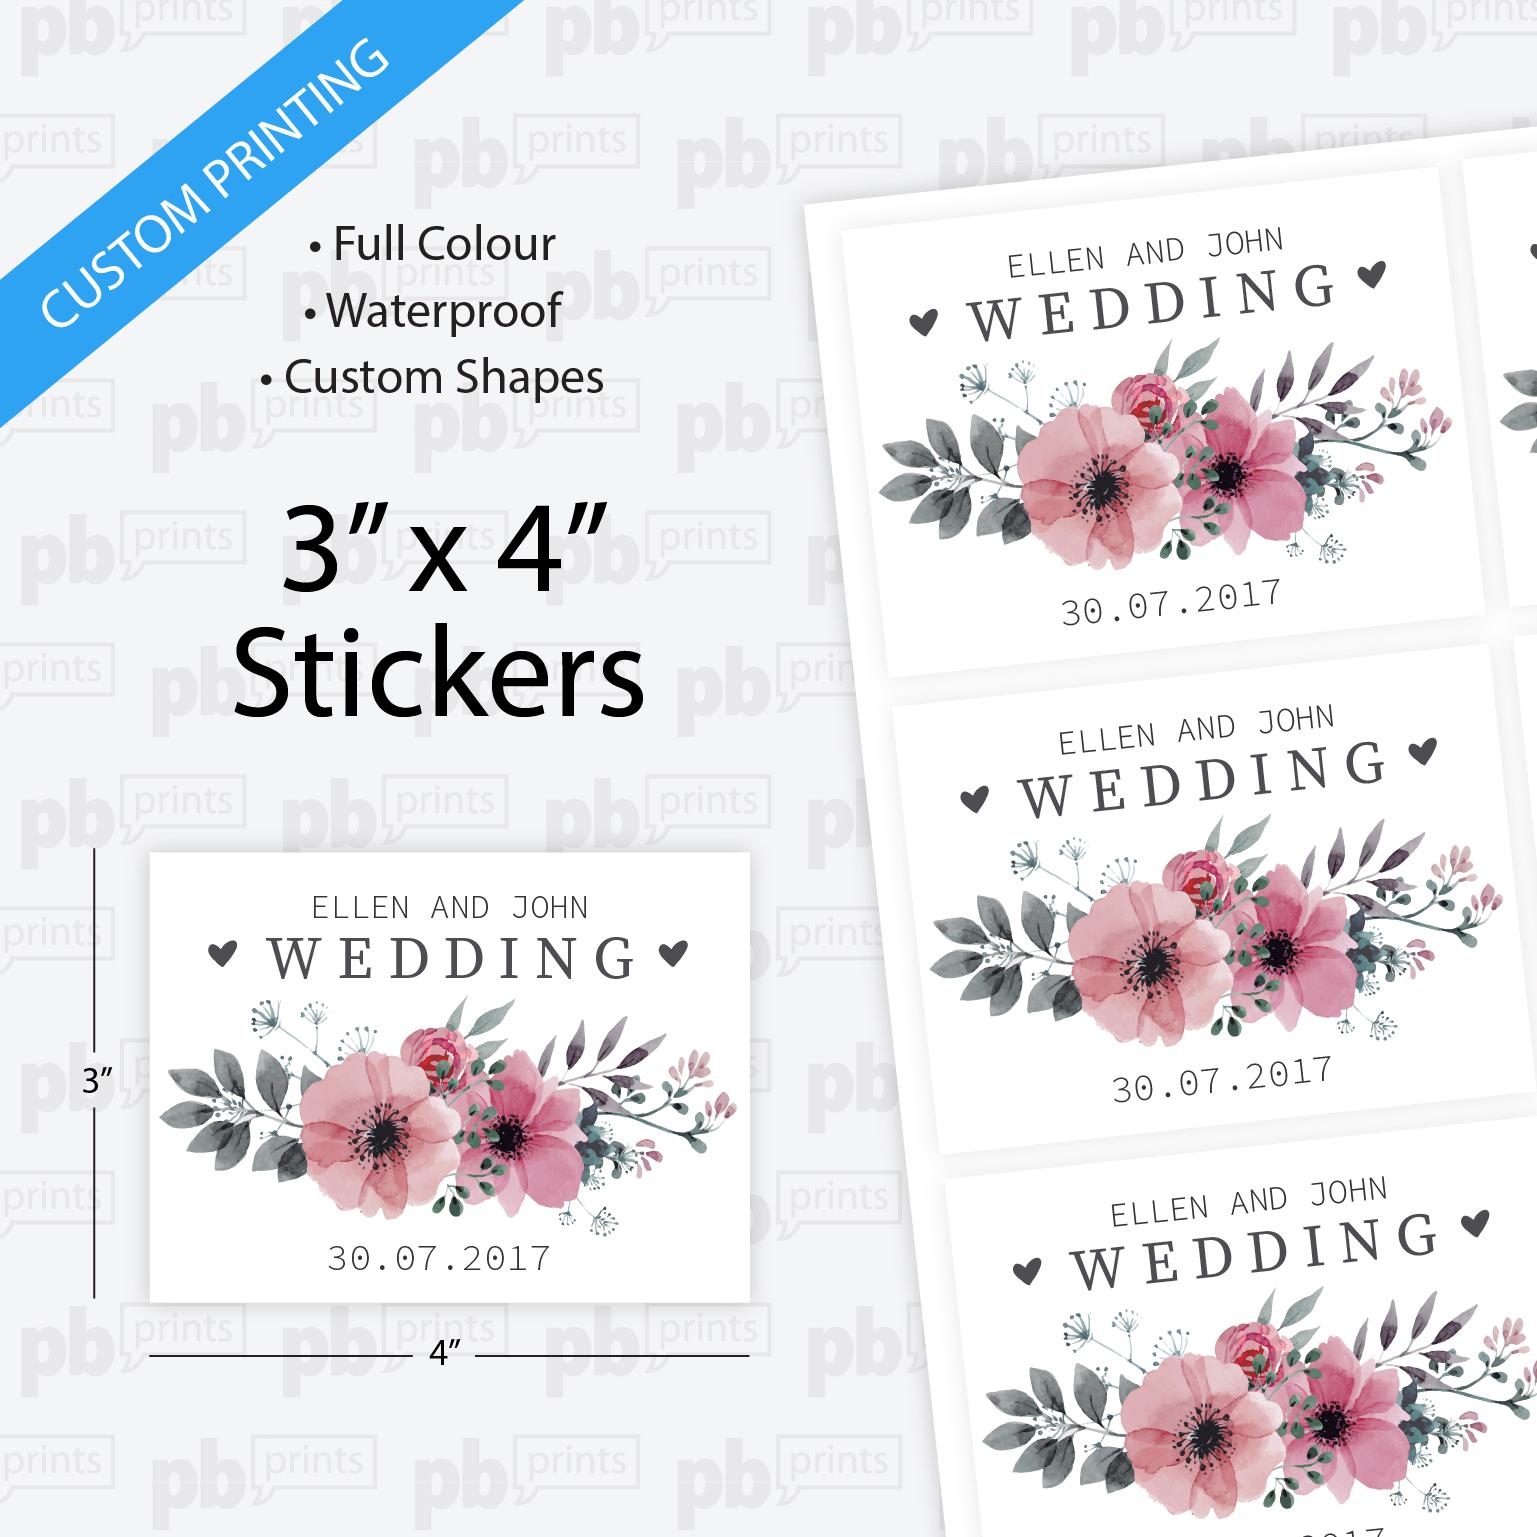 3x4 inch stickers